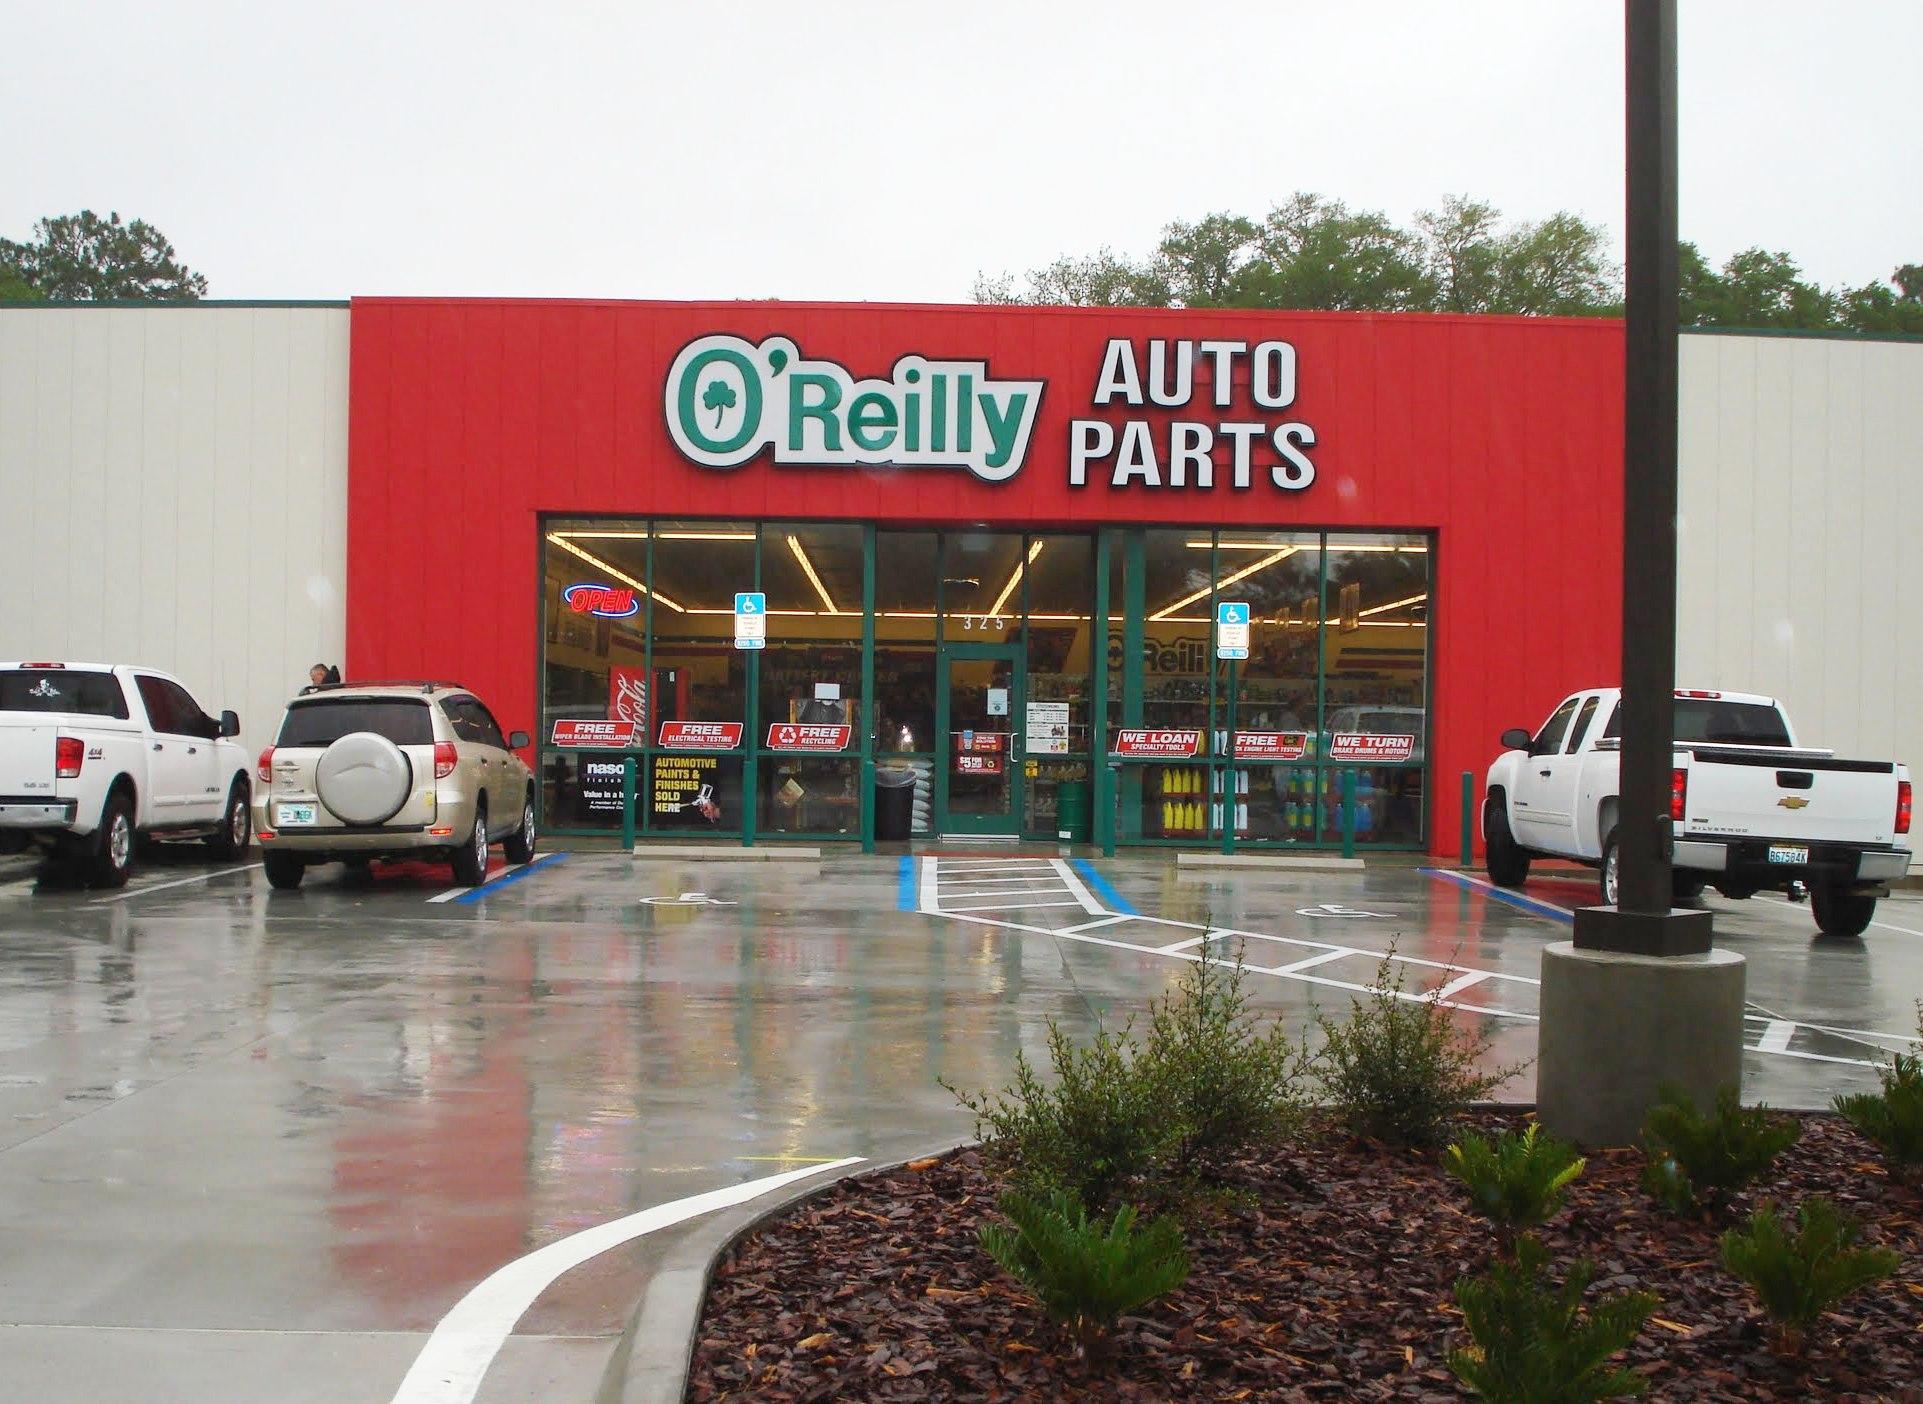 Auto parts st augustine : October 2018 Discount